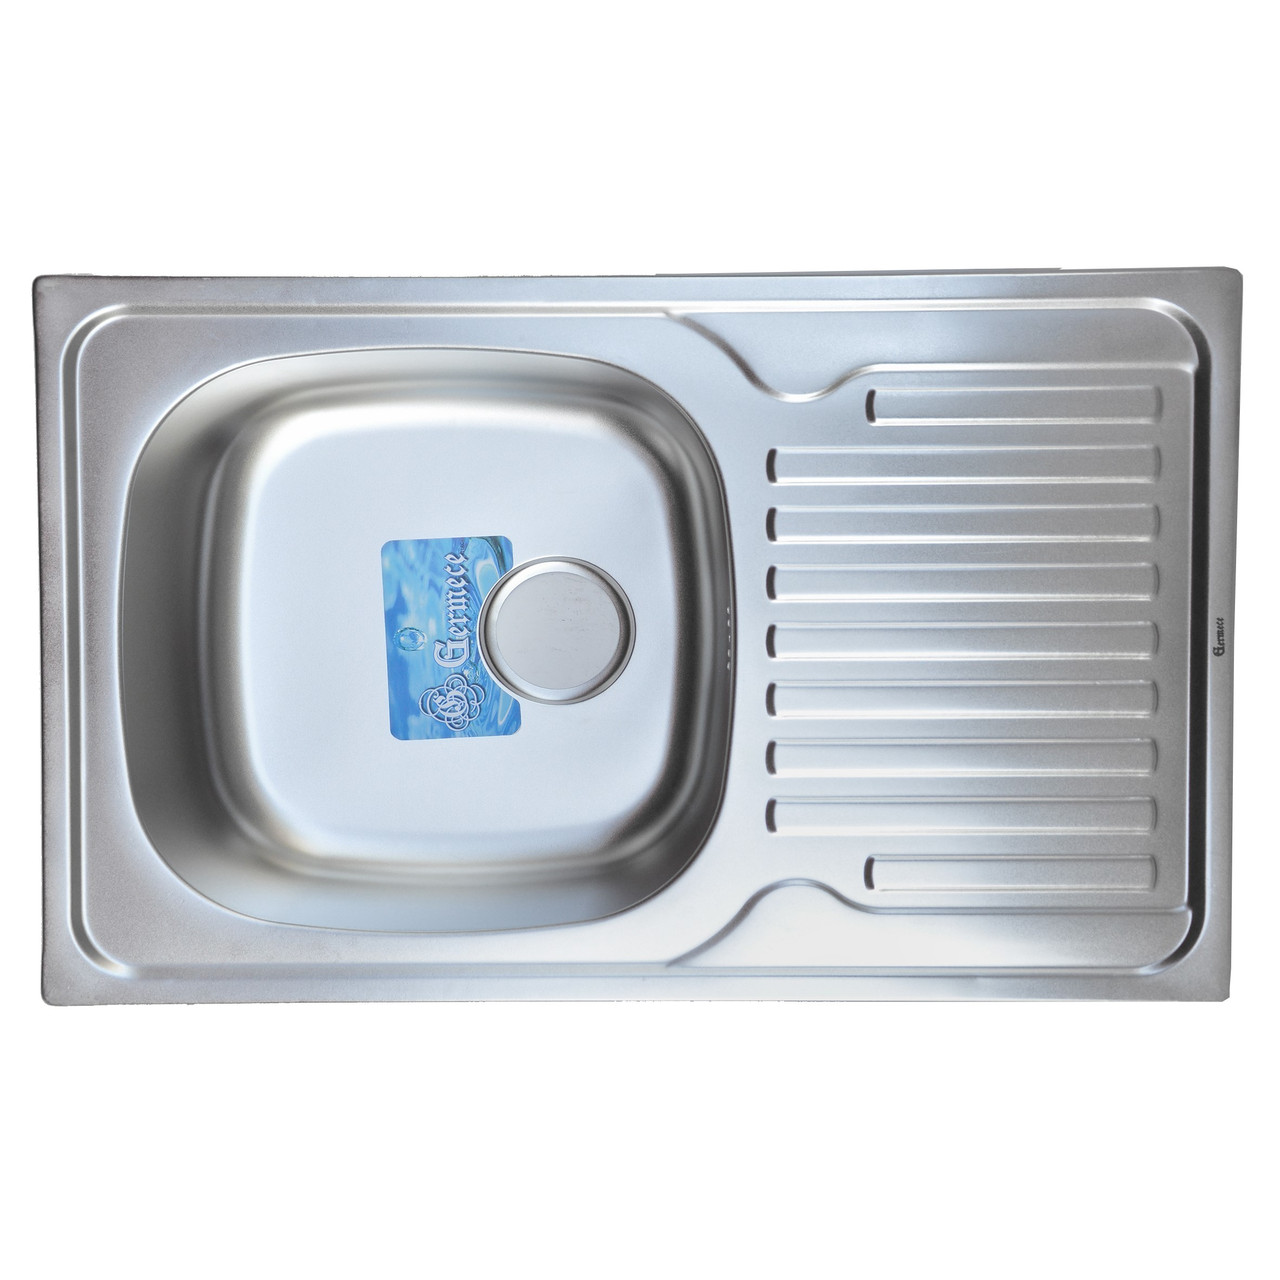 Кухонная мойка Germece 7850 микро-декор